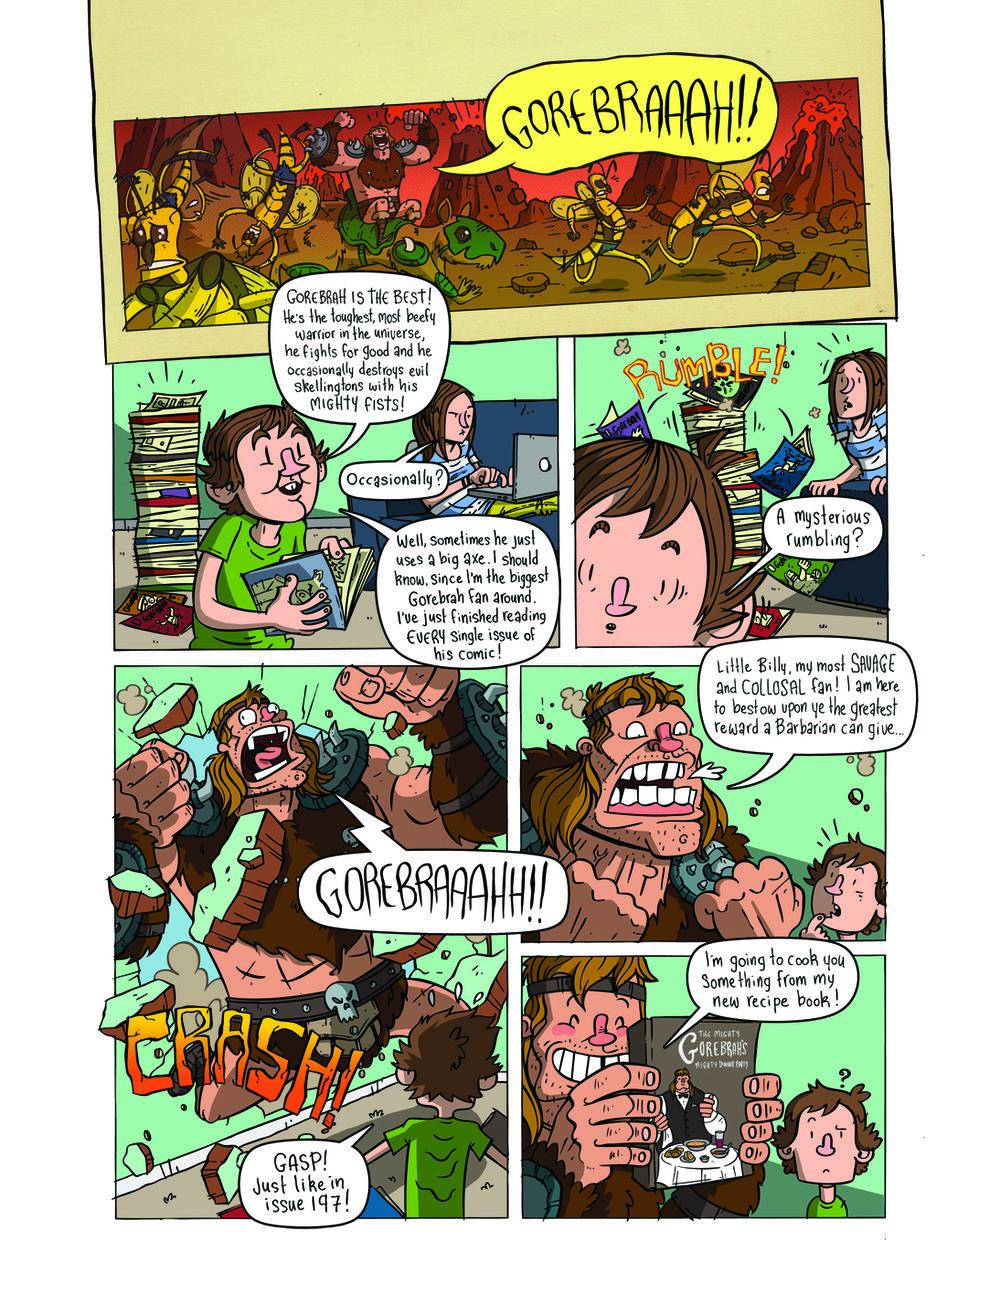 Gorebrah! (The Phoenix #316)